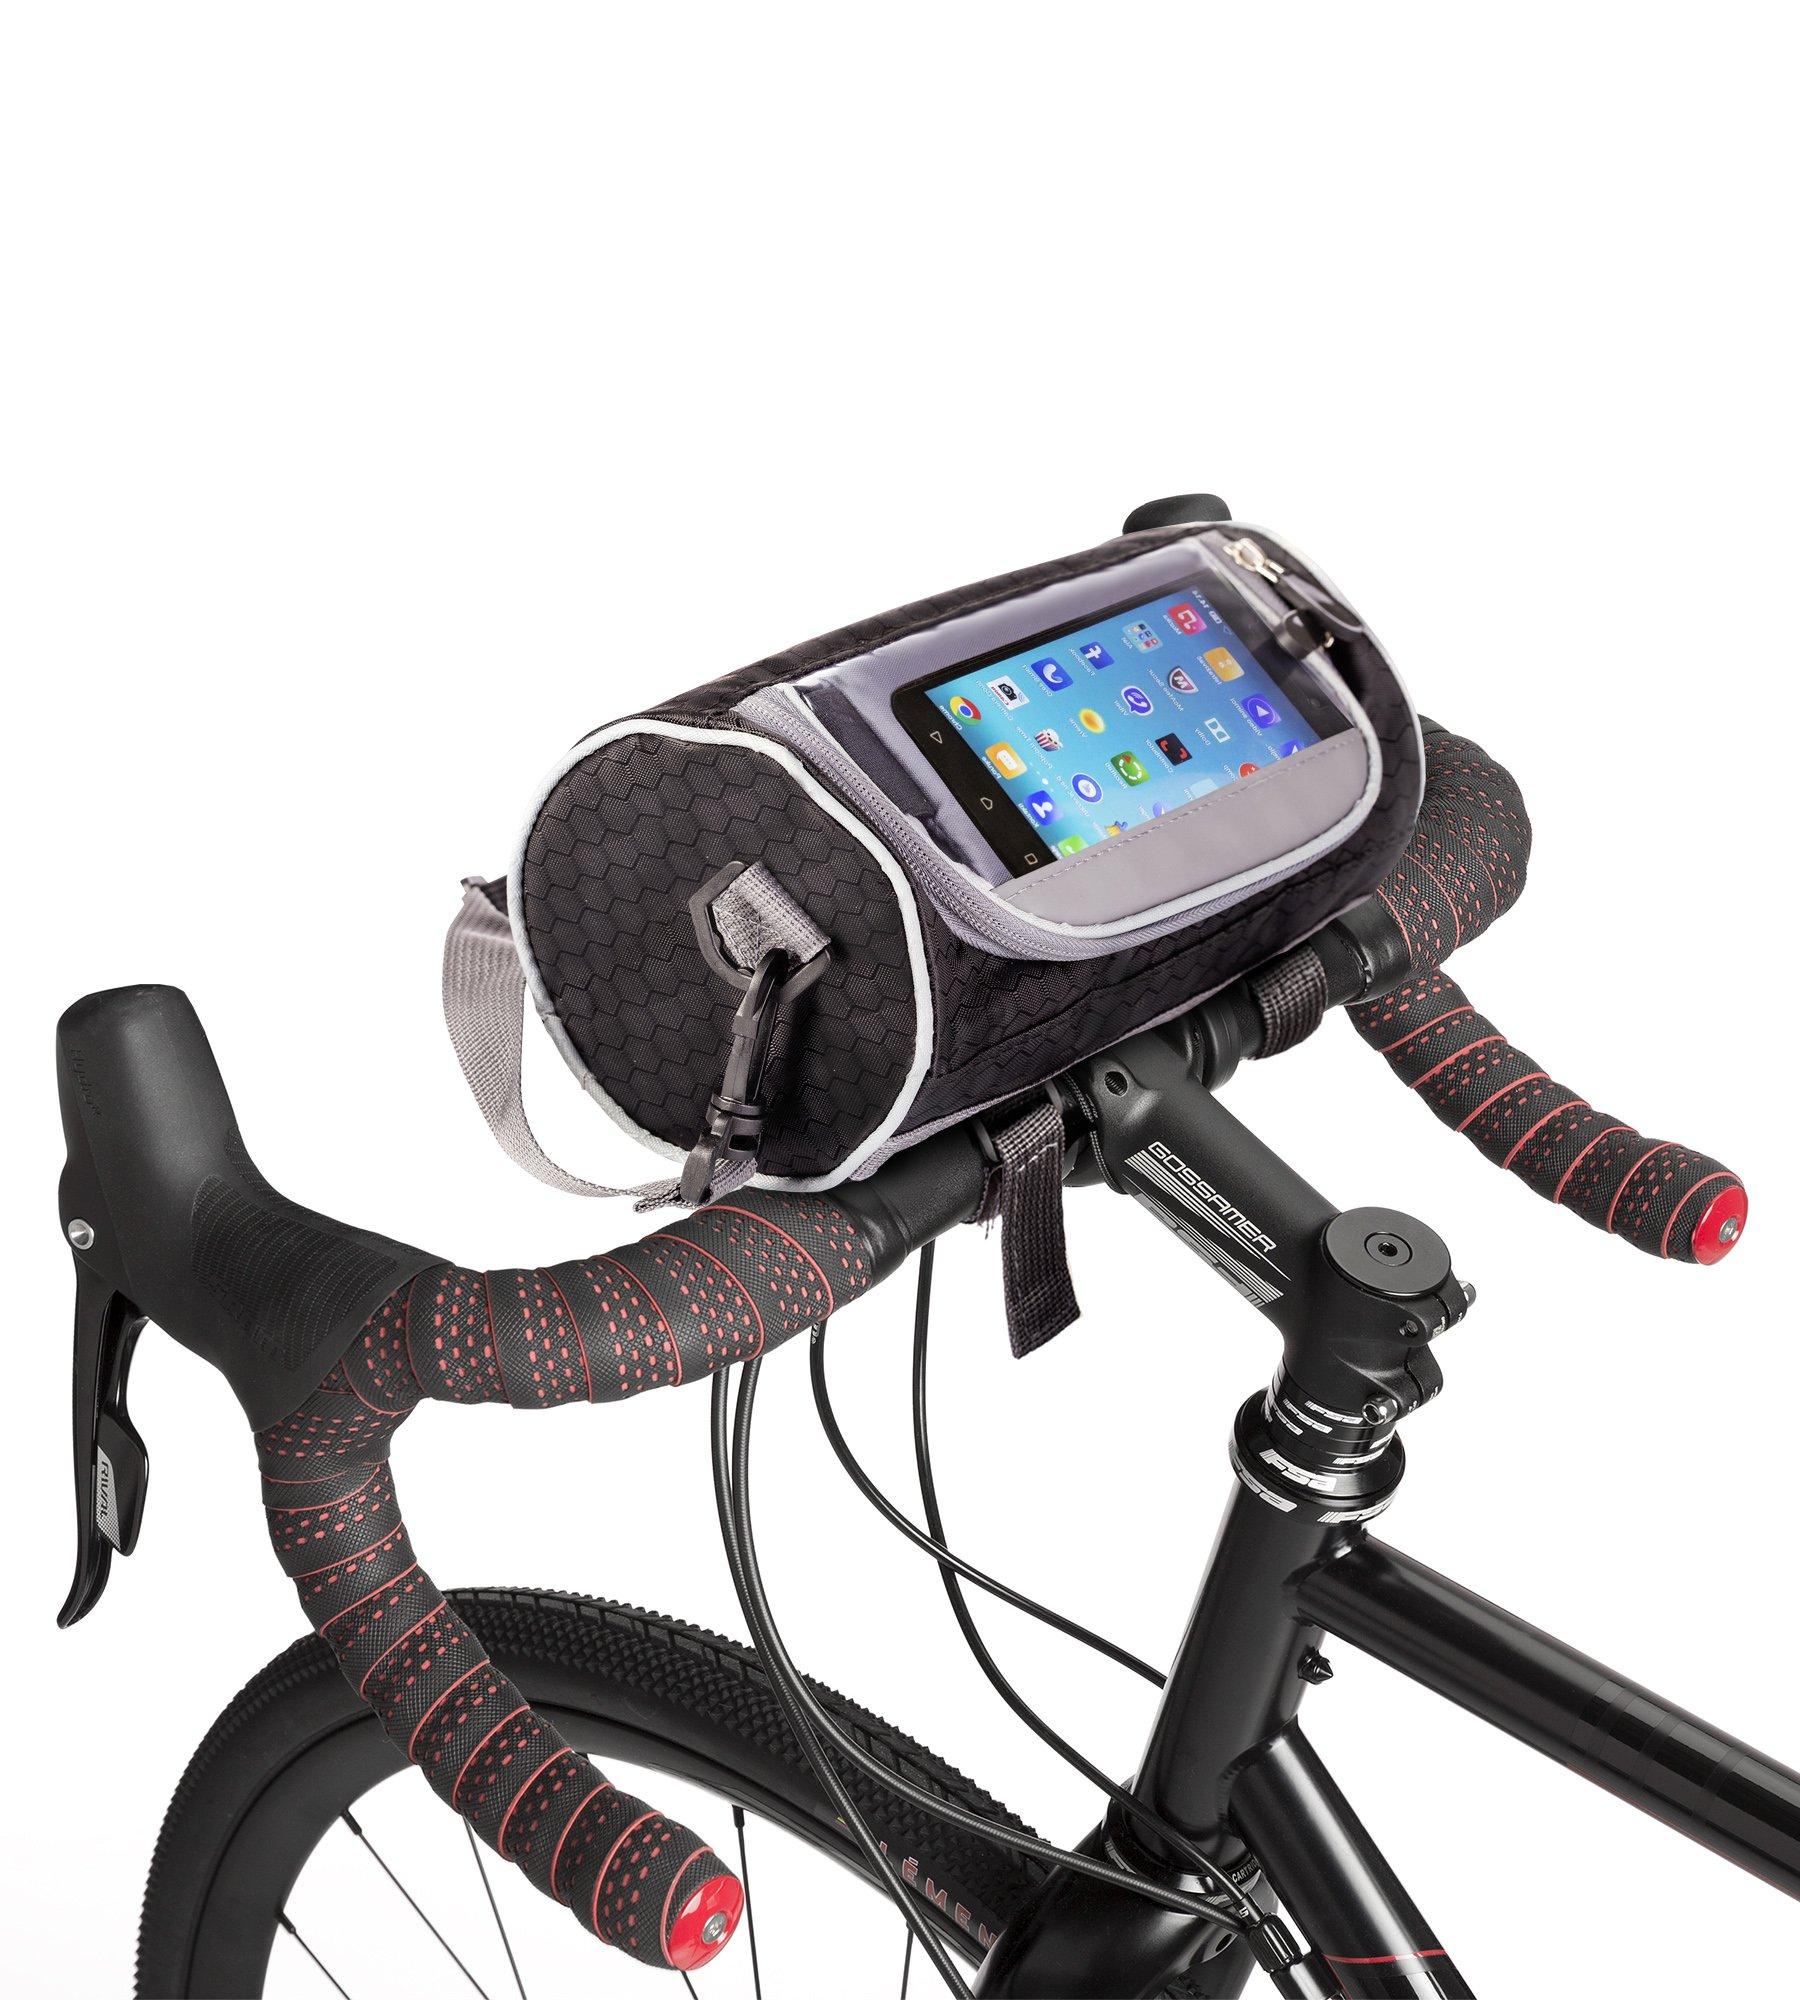 Boxiki travel Bicycle Handlebar Bag for Road Bikes, Mountain Bikes & Motorcycles. Bike Pannier Pouch w/Touchscreen Phone Holder. Waterproof Bike Frame Storage Bag Removable Shoulder Strap by Boxiki travel (Image #1)